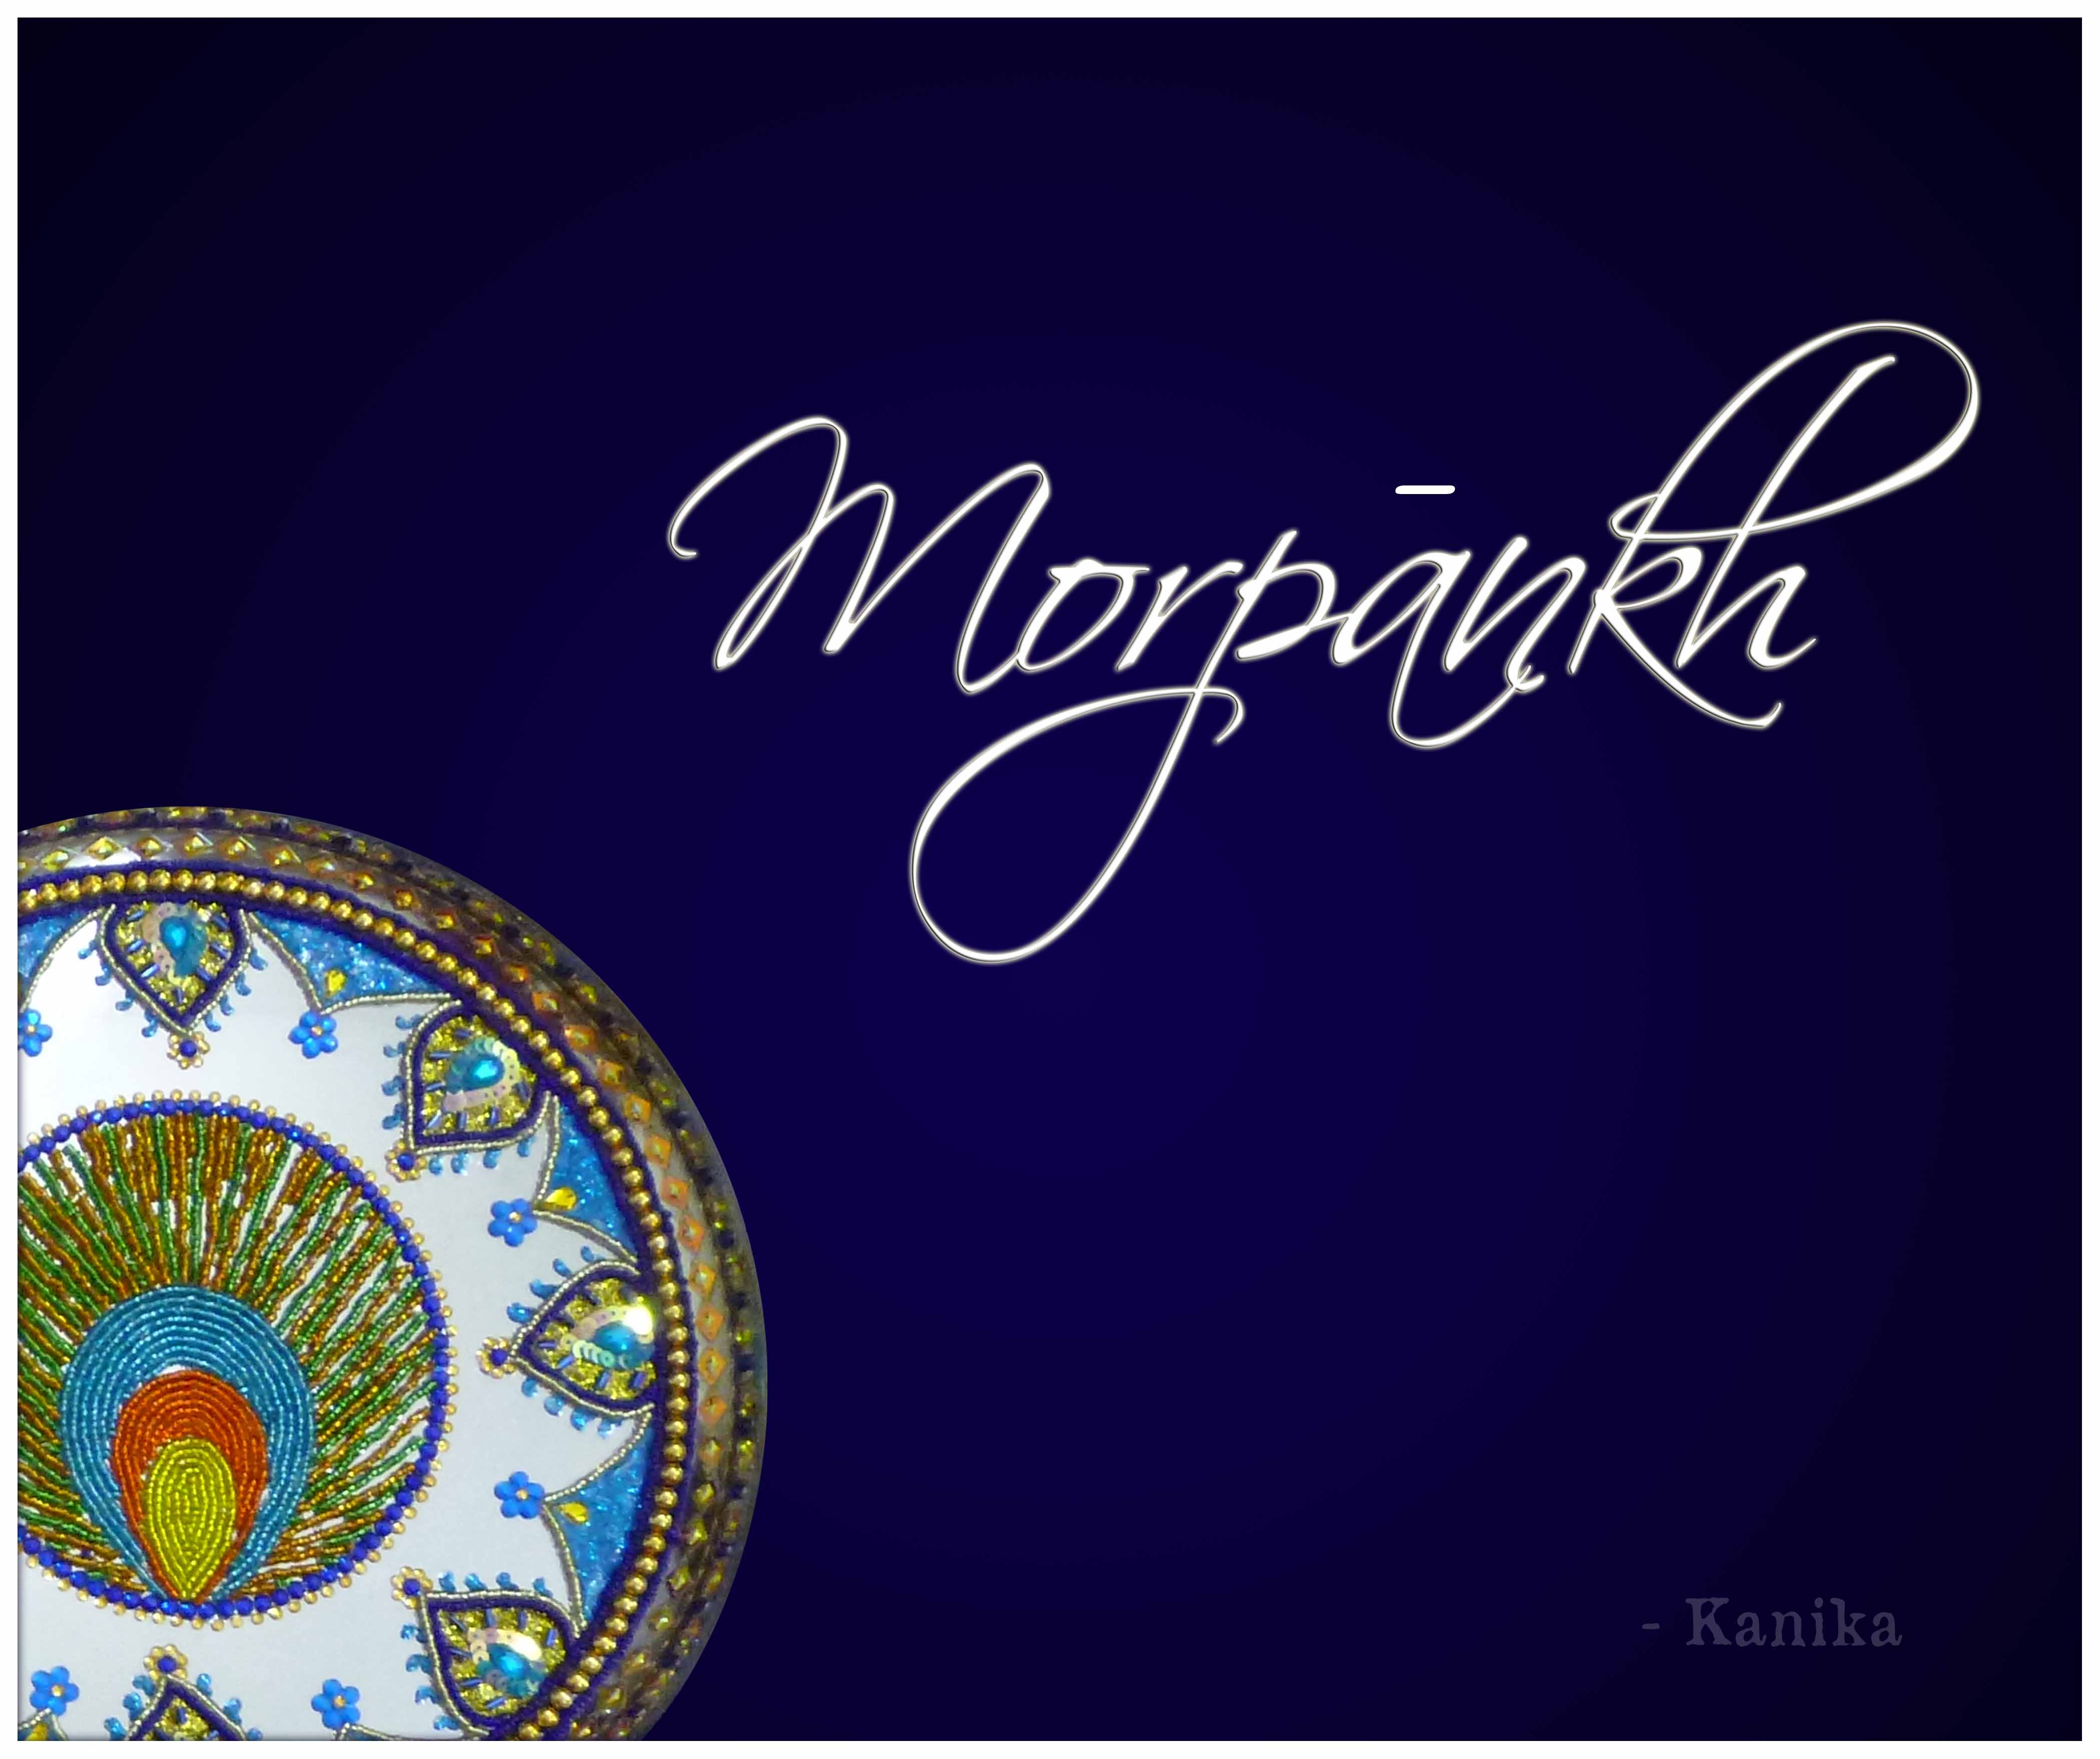 Morpankh